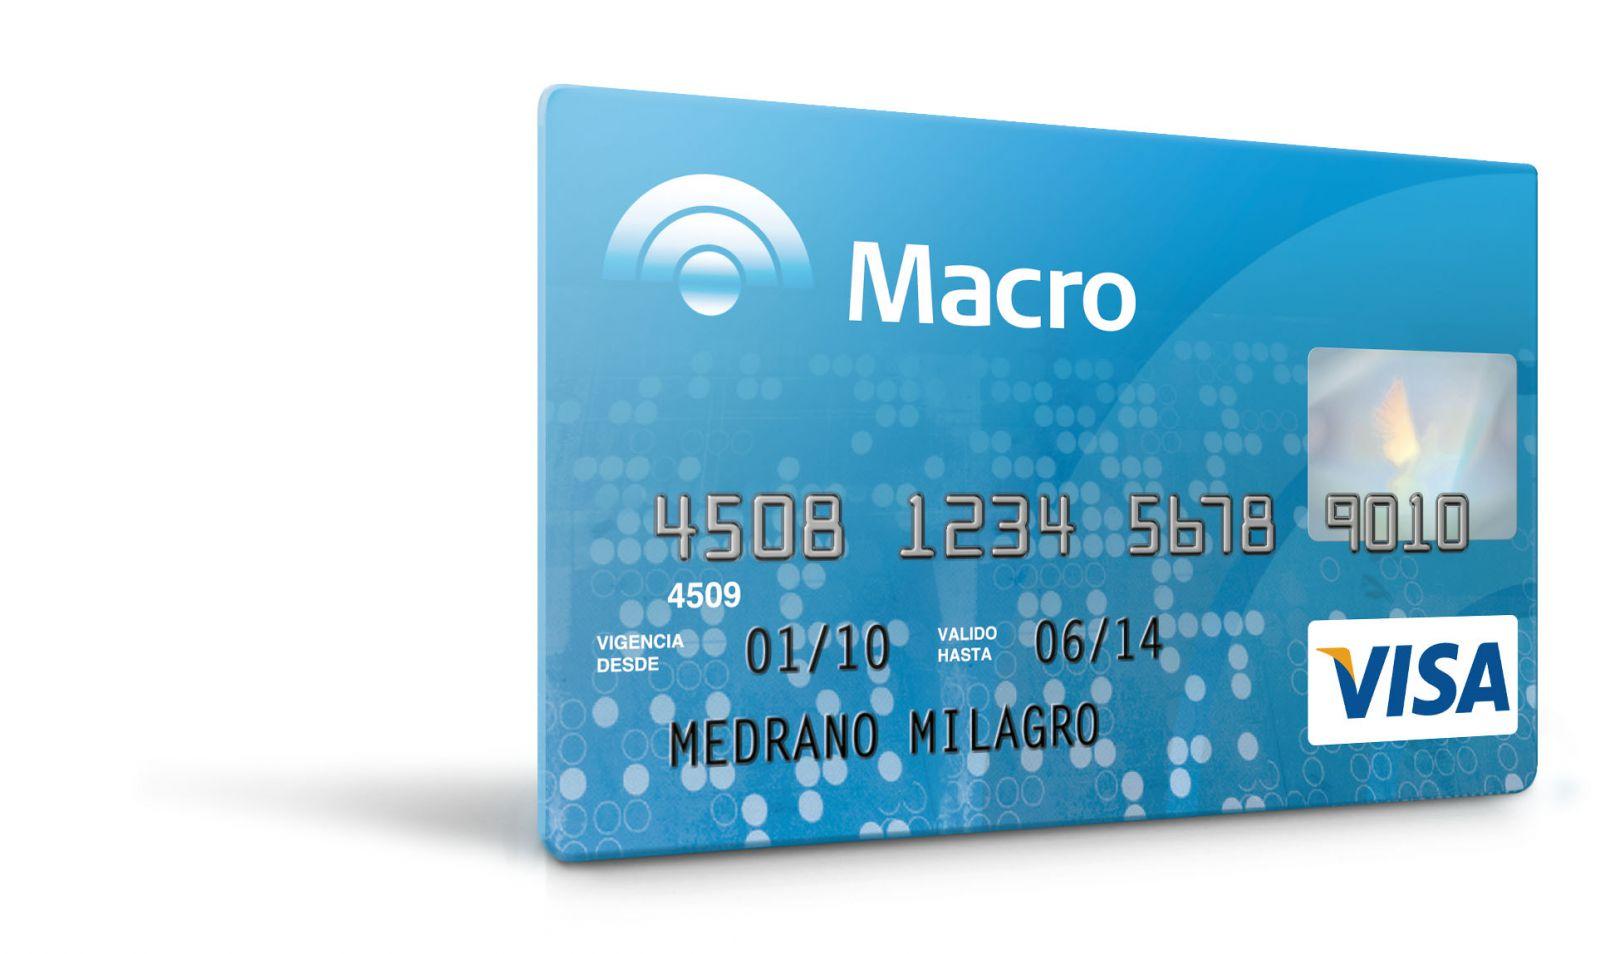 [Duda] Visa banco macro